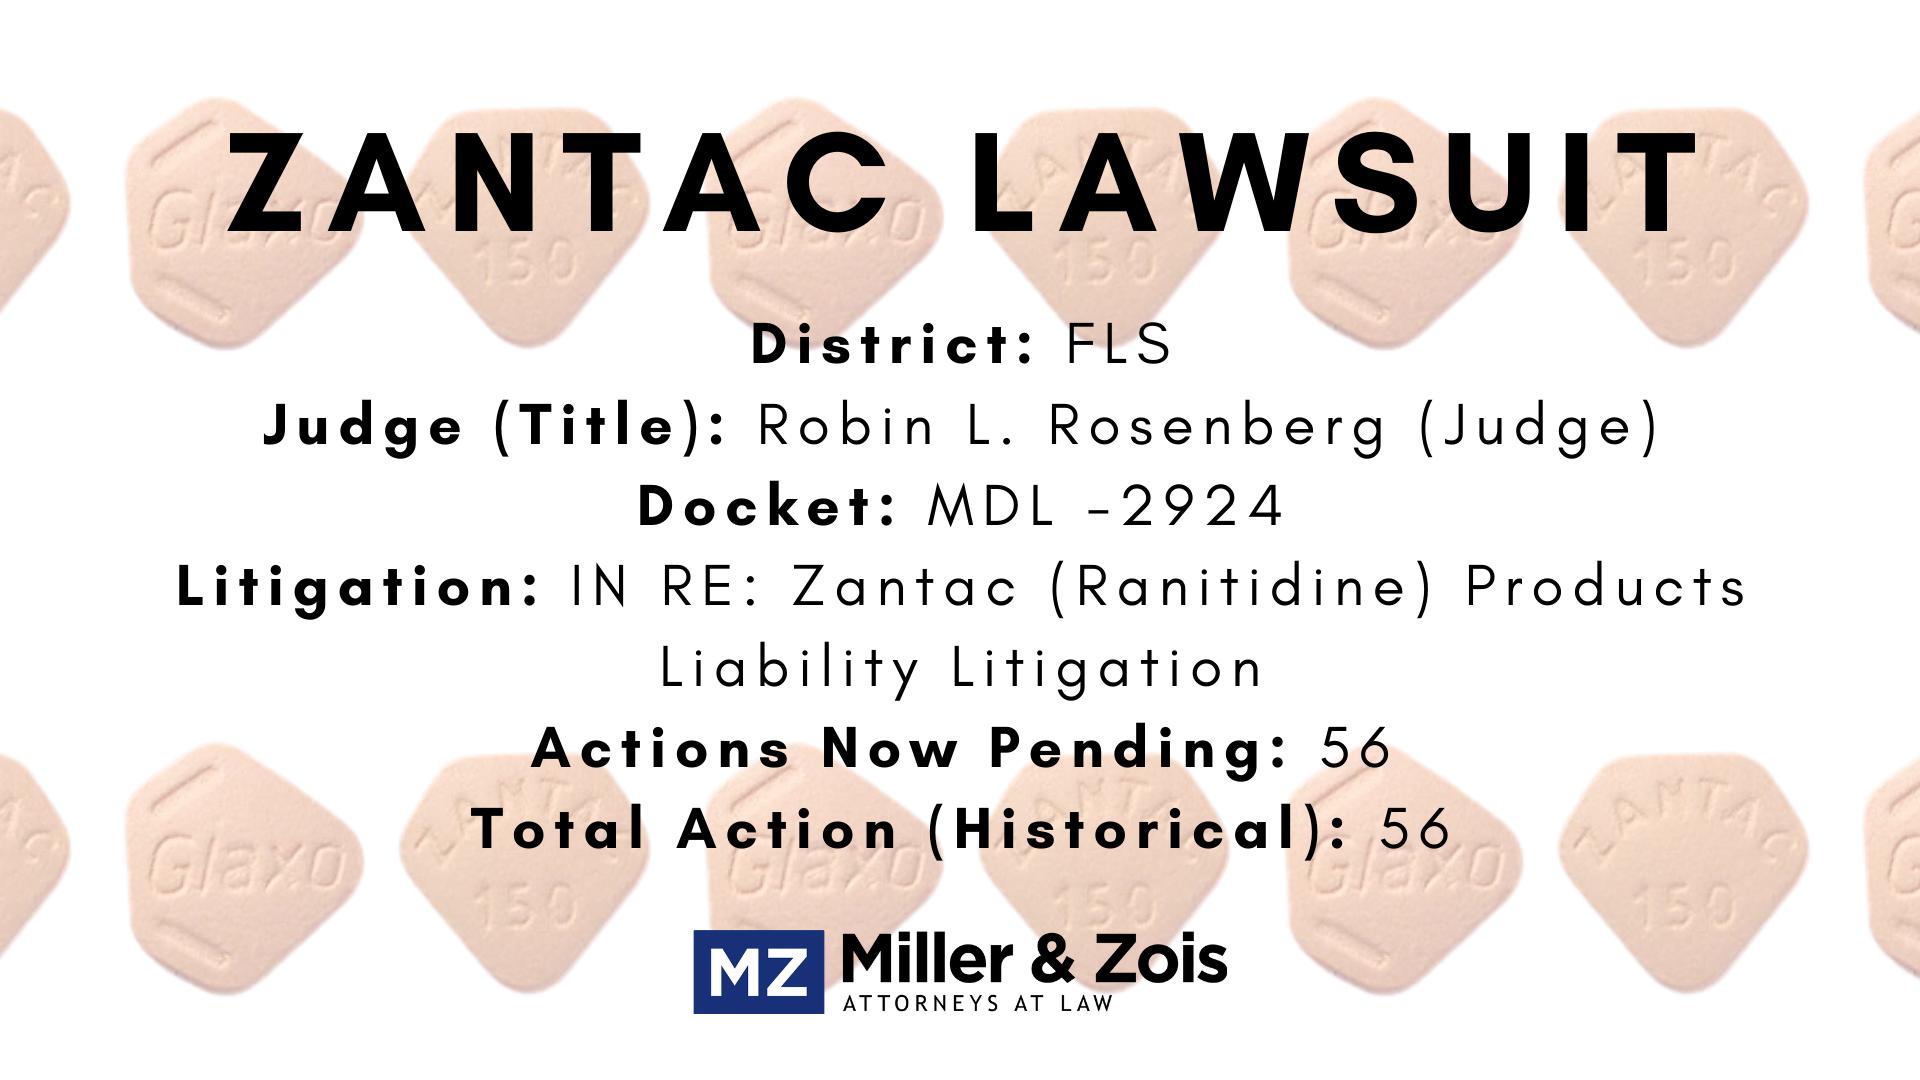 Zantac-Lawsuit